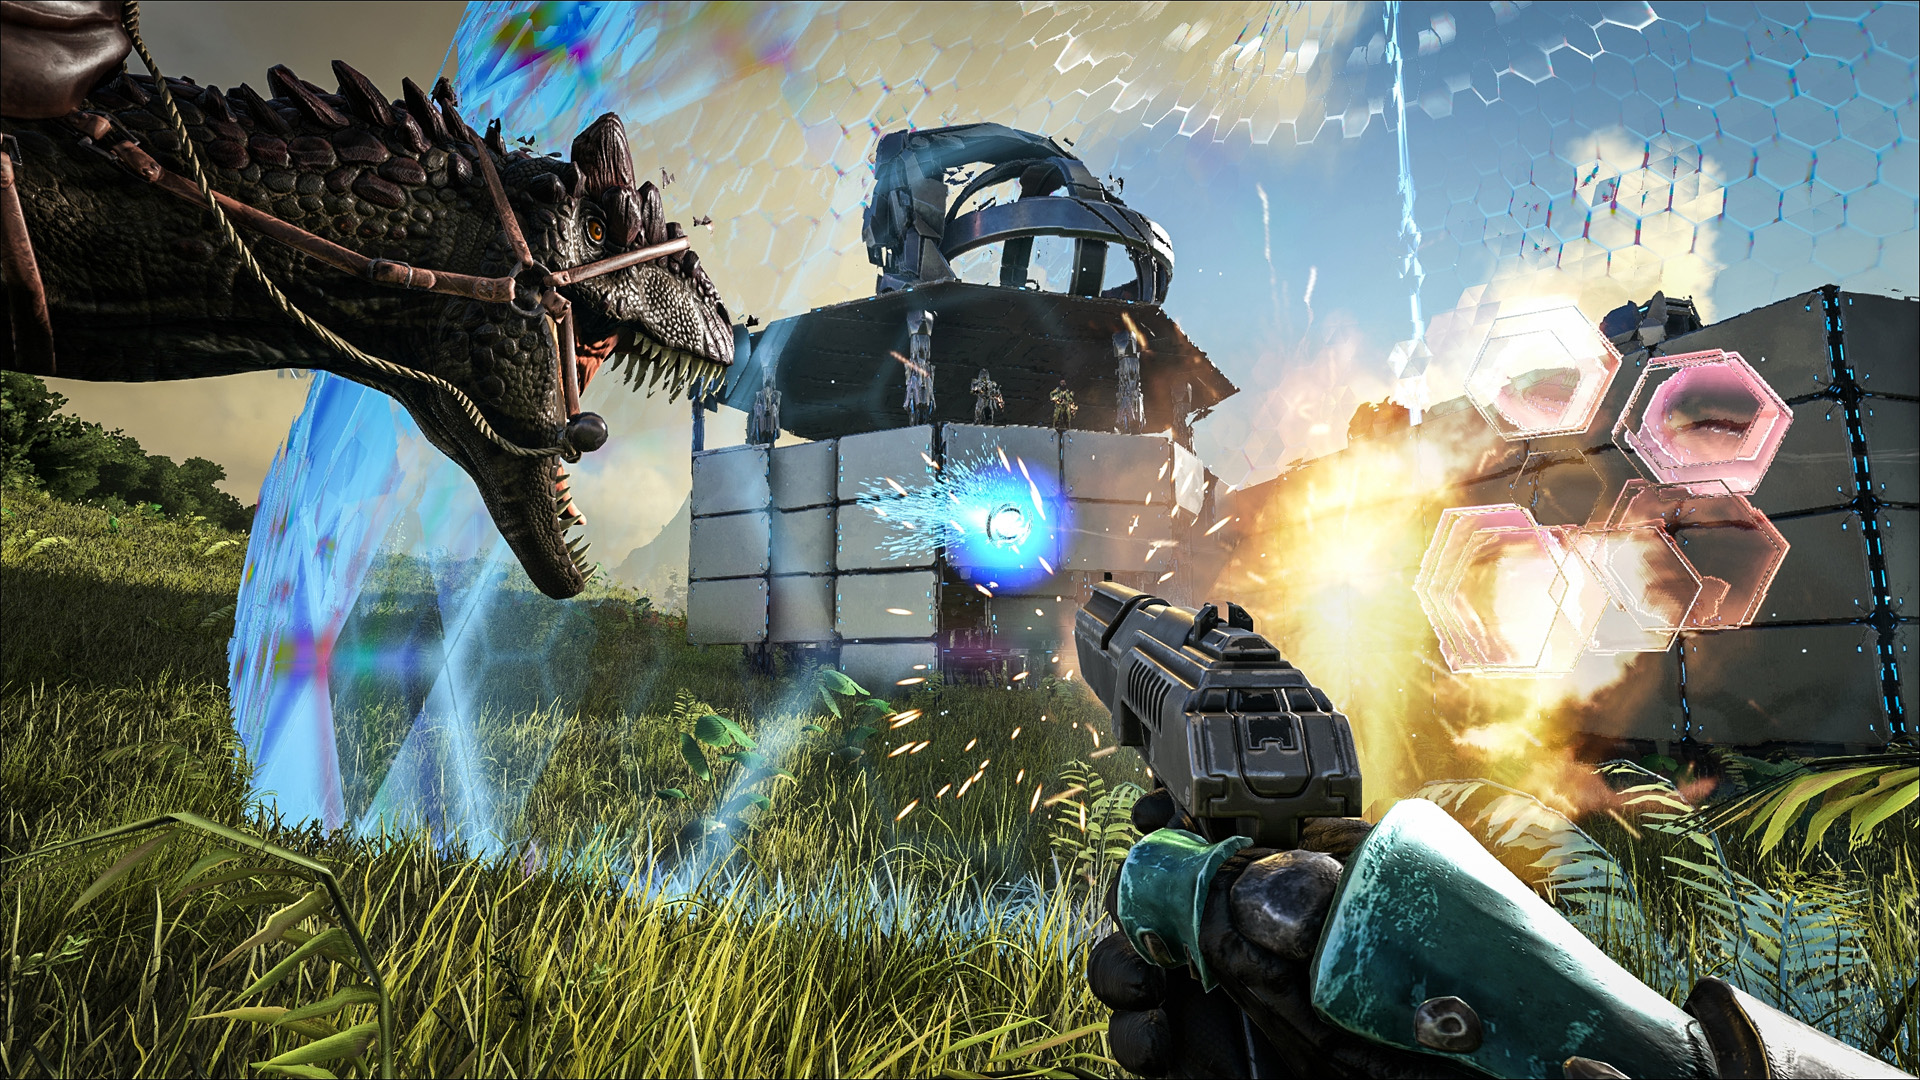 ark-survival-evolved-pc-screenshot-www.ovagames.com-04